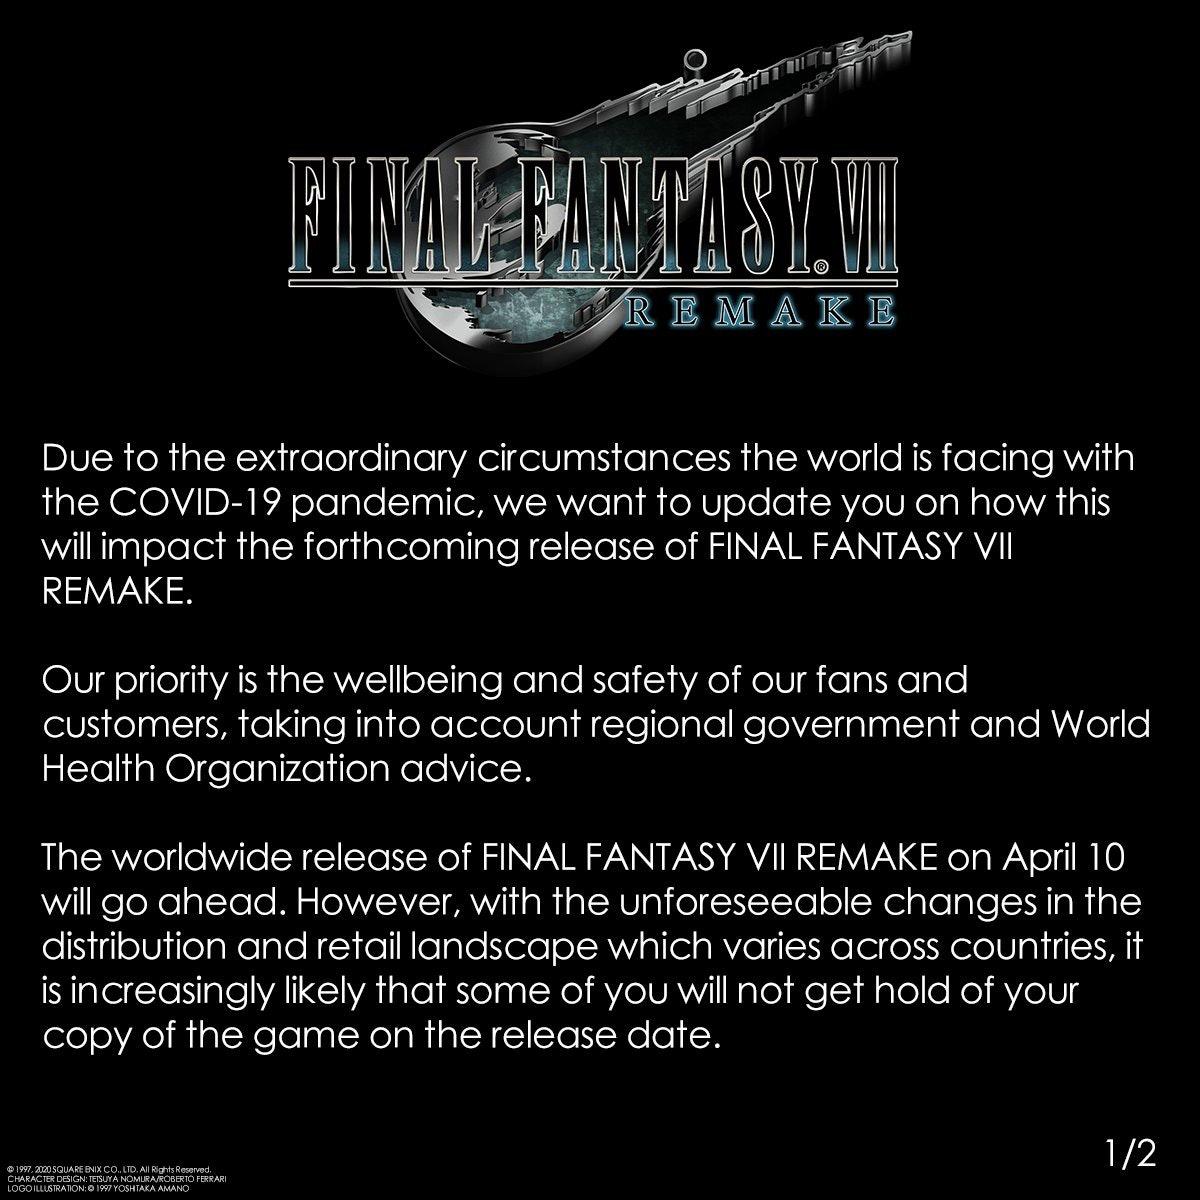 Final Fantasy 7 Remake Delayed Coronavirus Causes Release Date Concerns